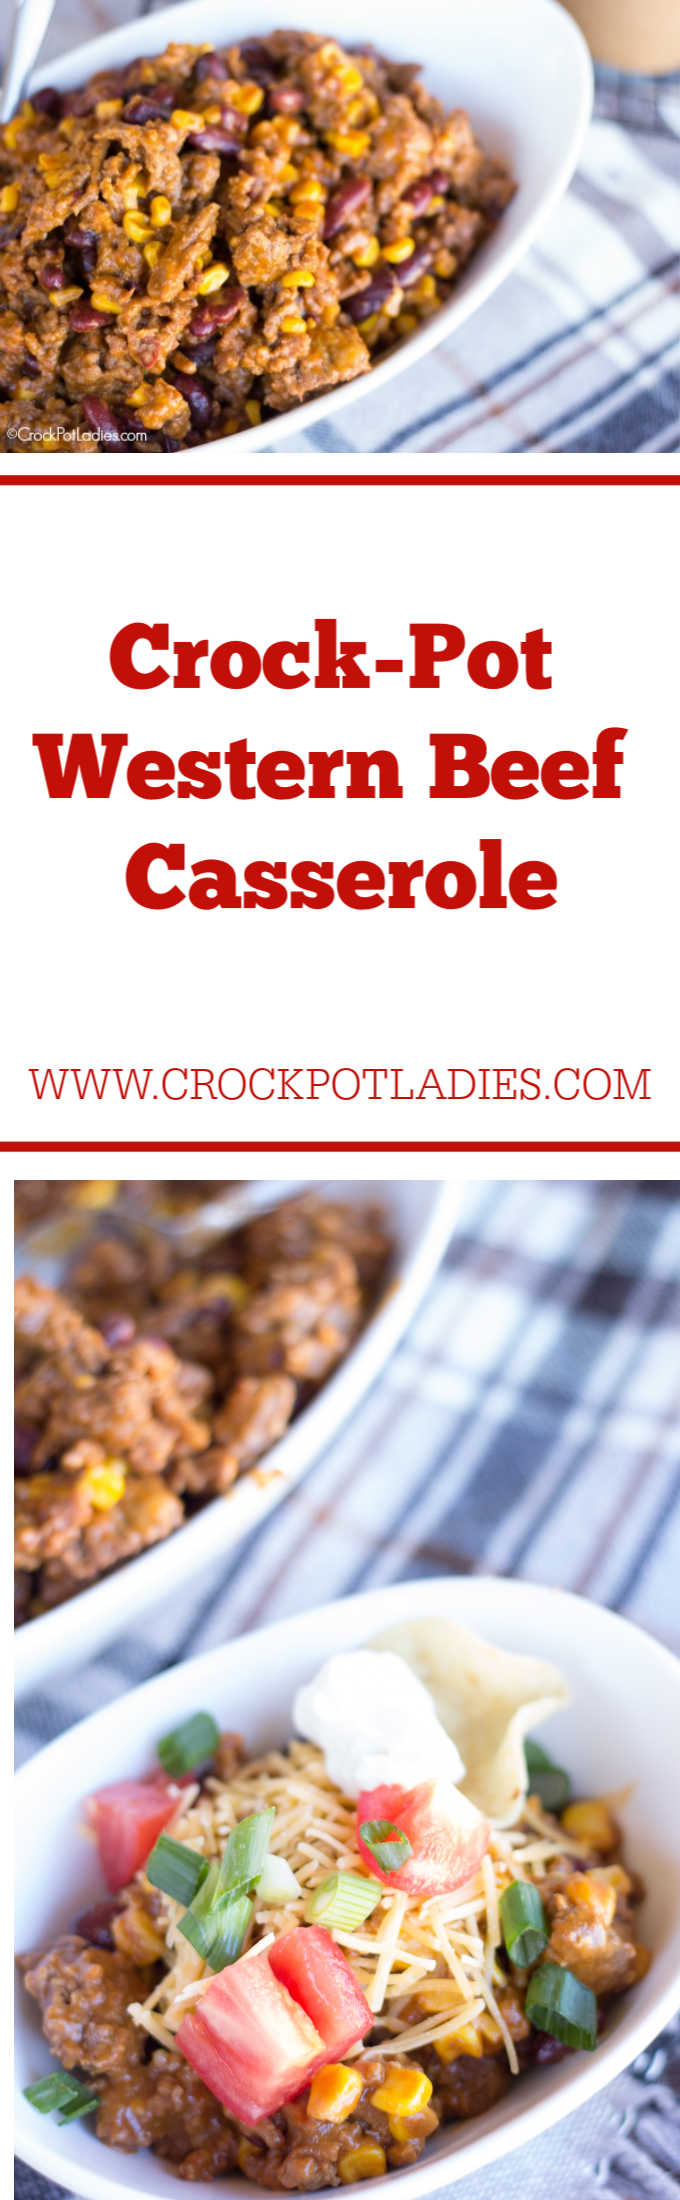 Crock-Pot Western Beef Casserole